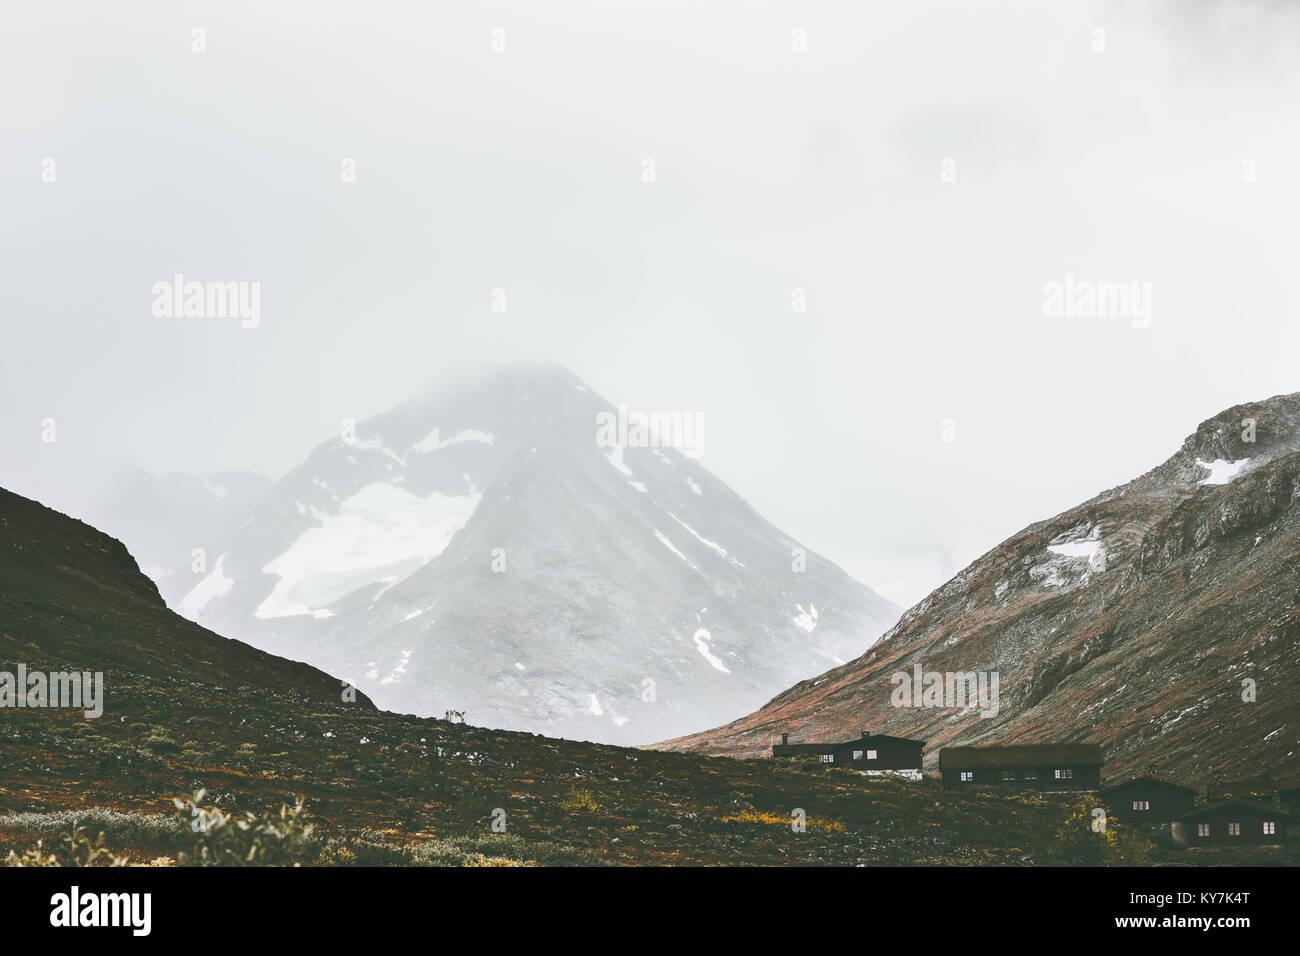 Foggy Mountains Landscape in Jotunheimen national park Norway Travel scandinavian scenery - Stock Image